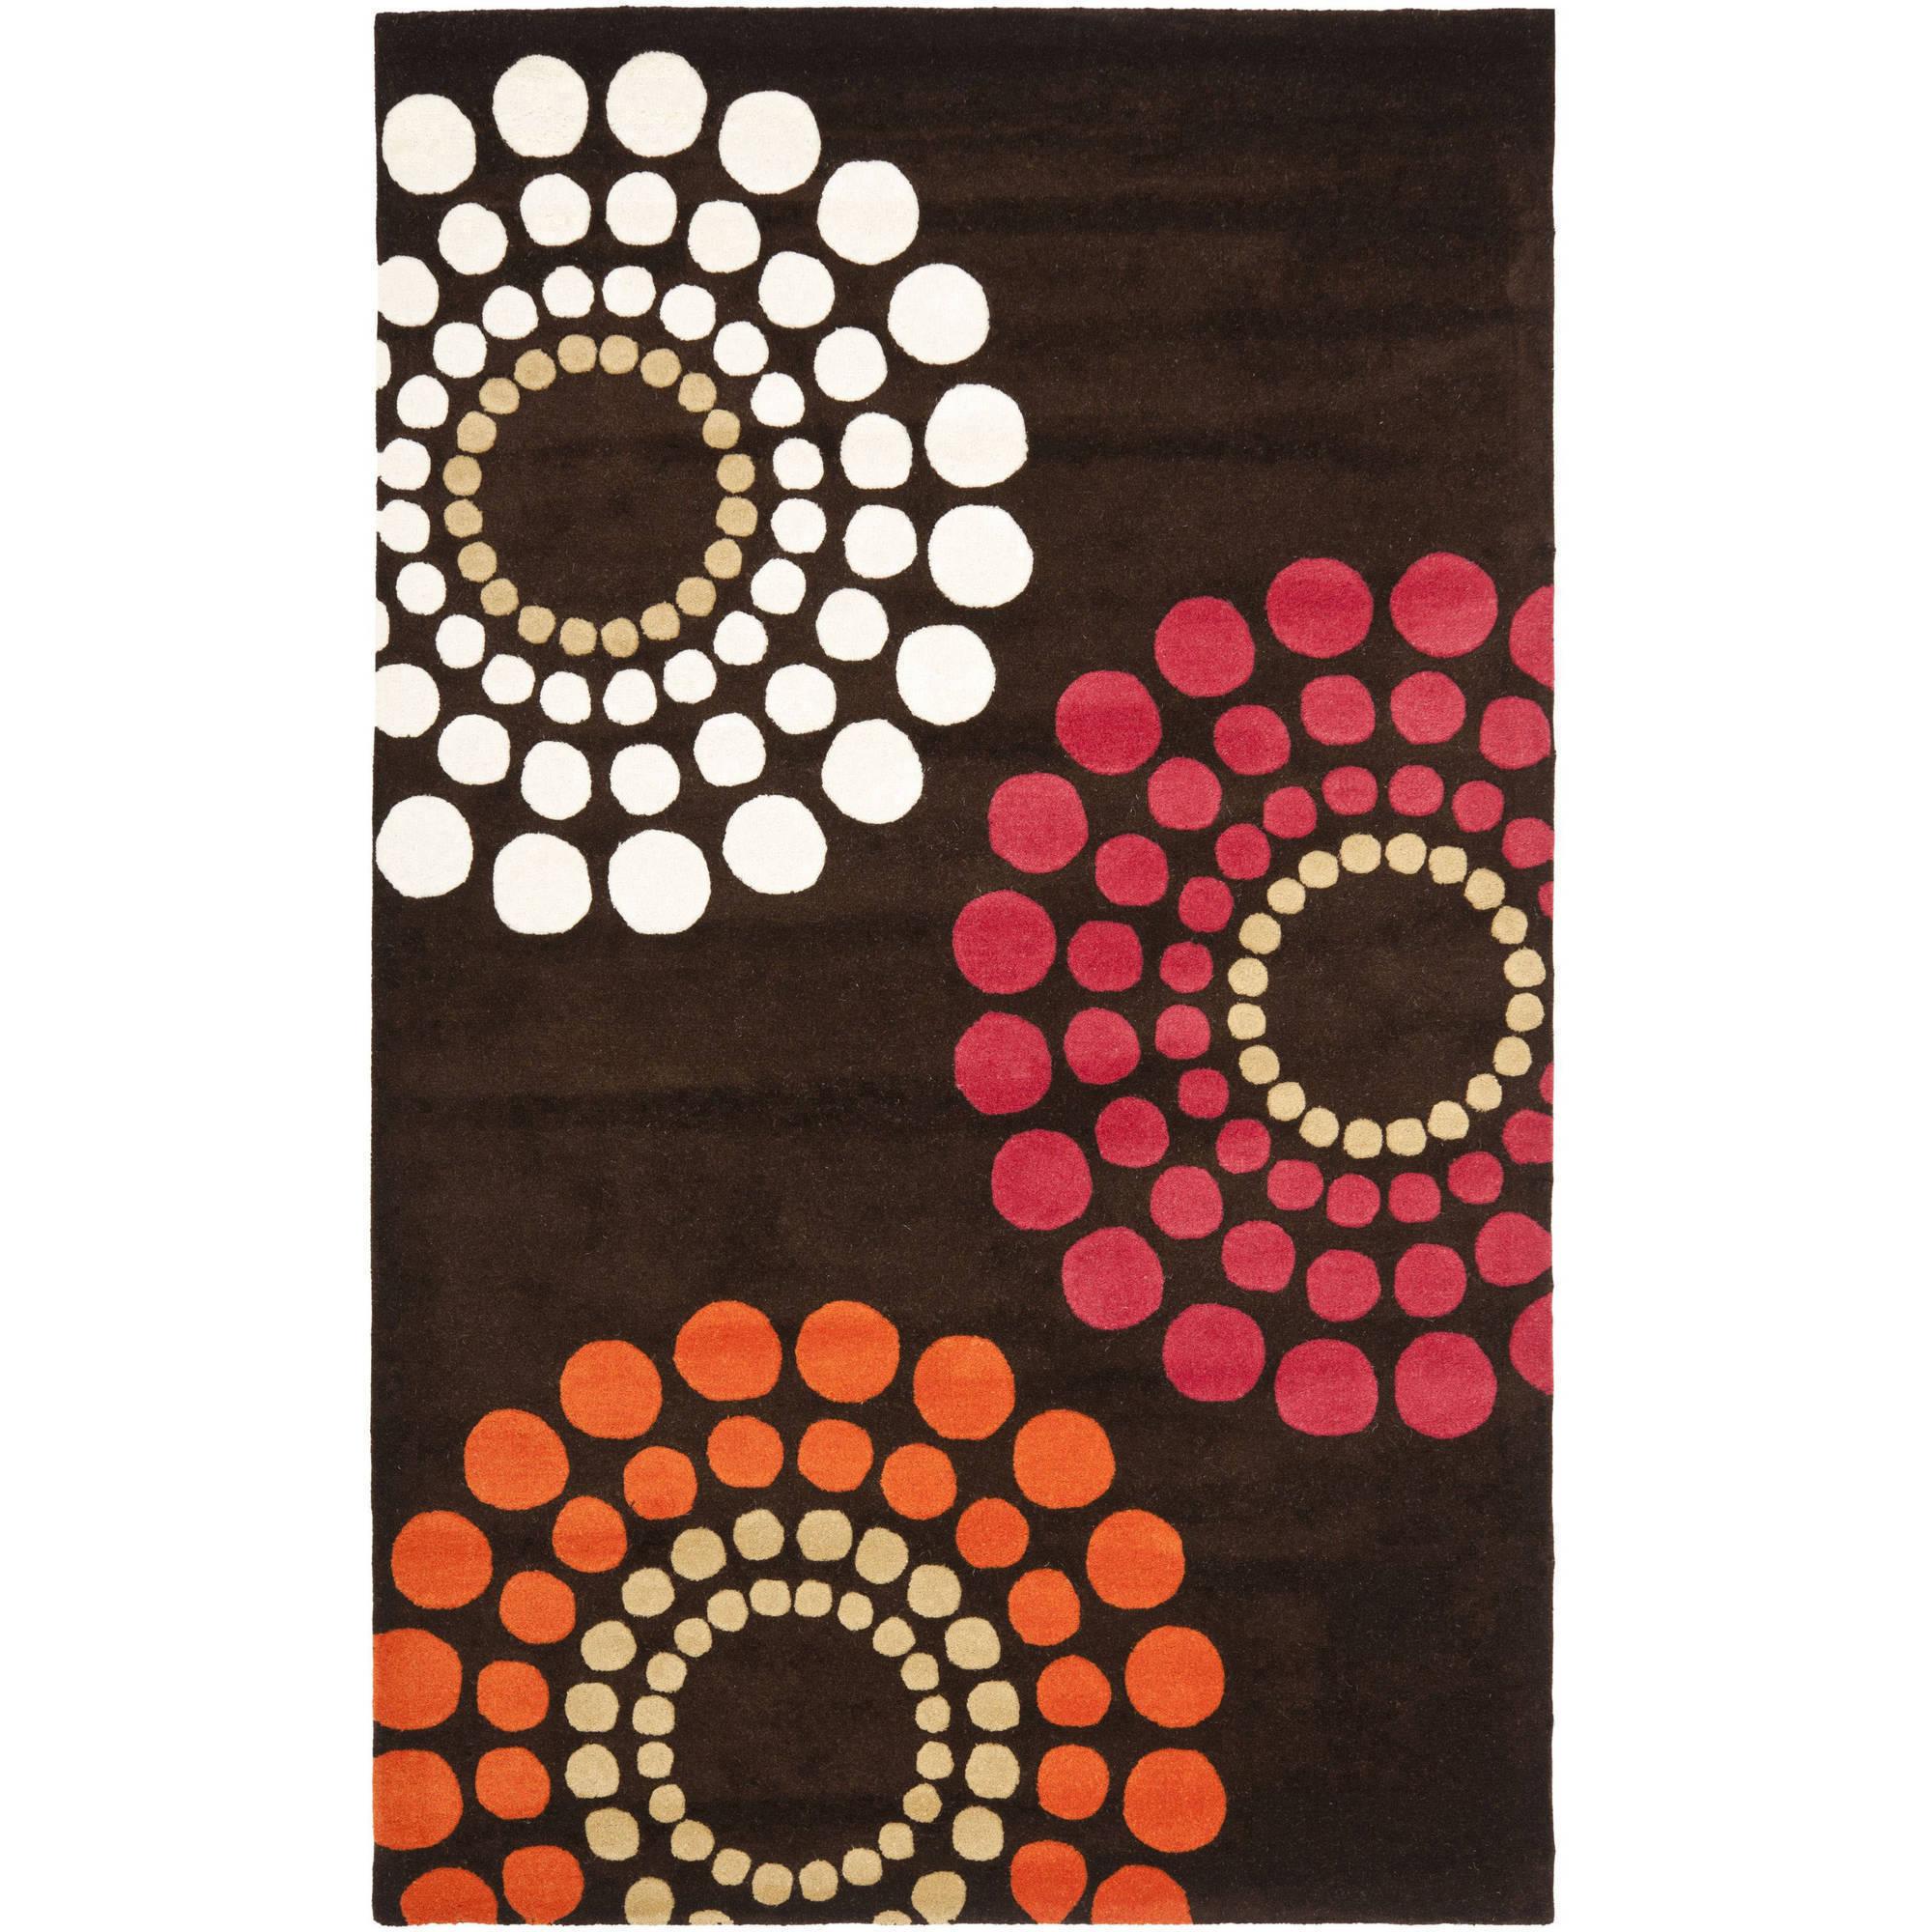 Safavieh Soho Louise Polka Dots Wool Area Rug or Runner